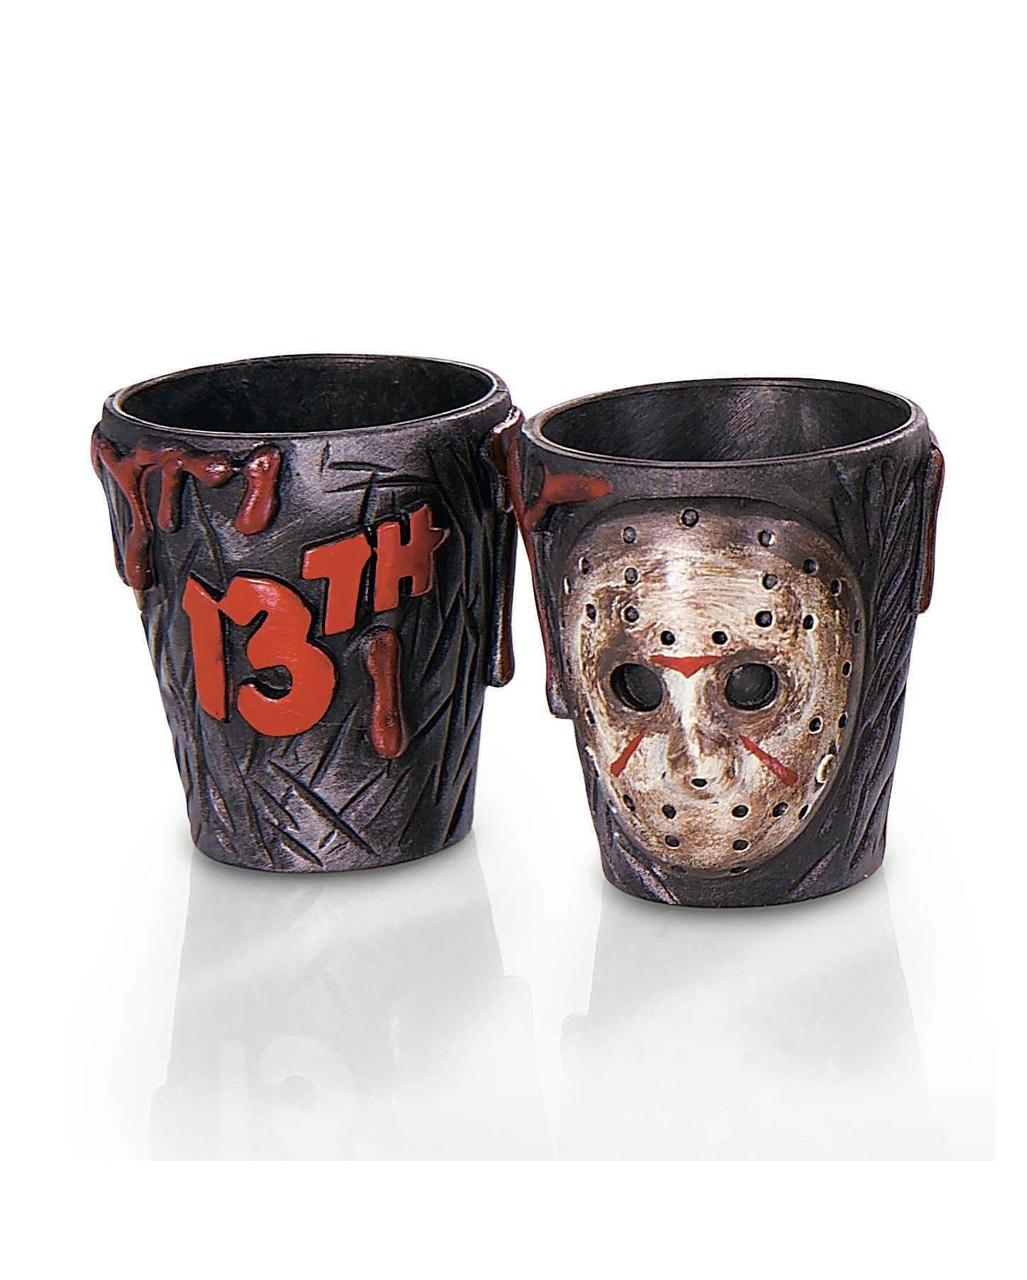 Jason Schnapsgläser 2 Stück Halloween Tischdeko | Horror-Shop.com